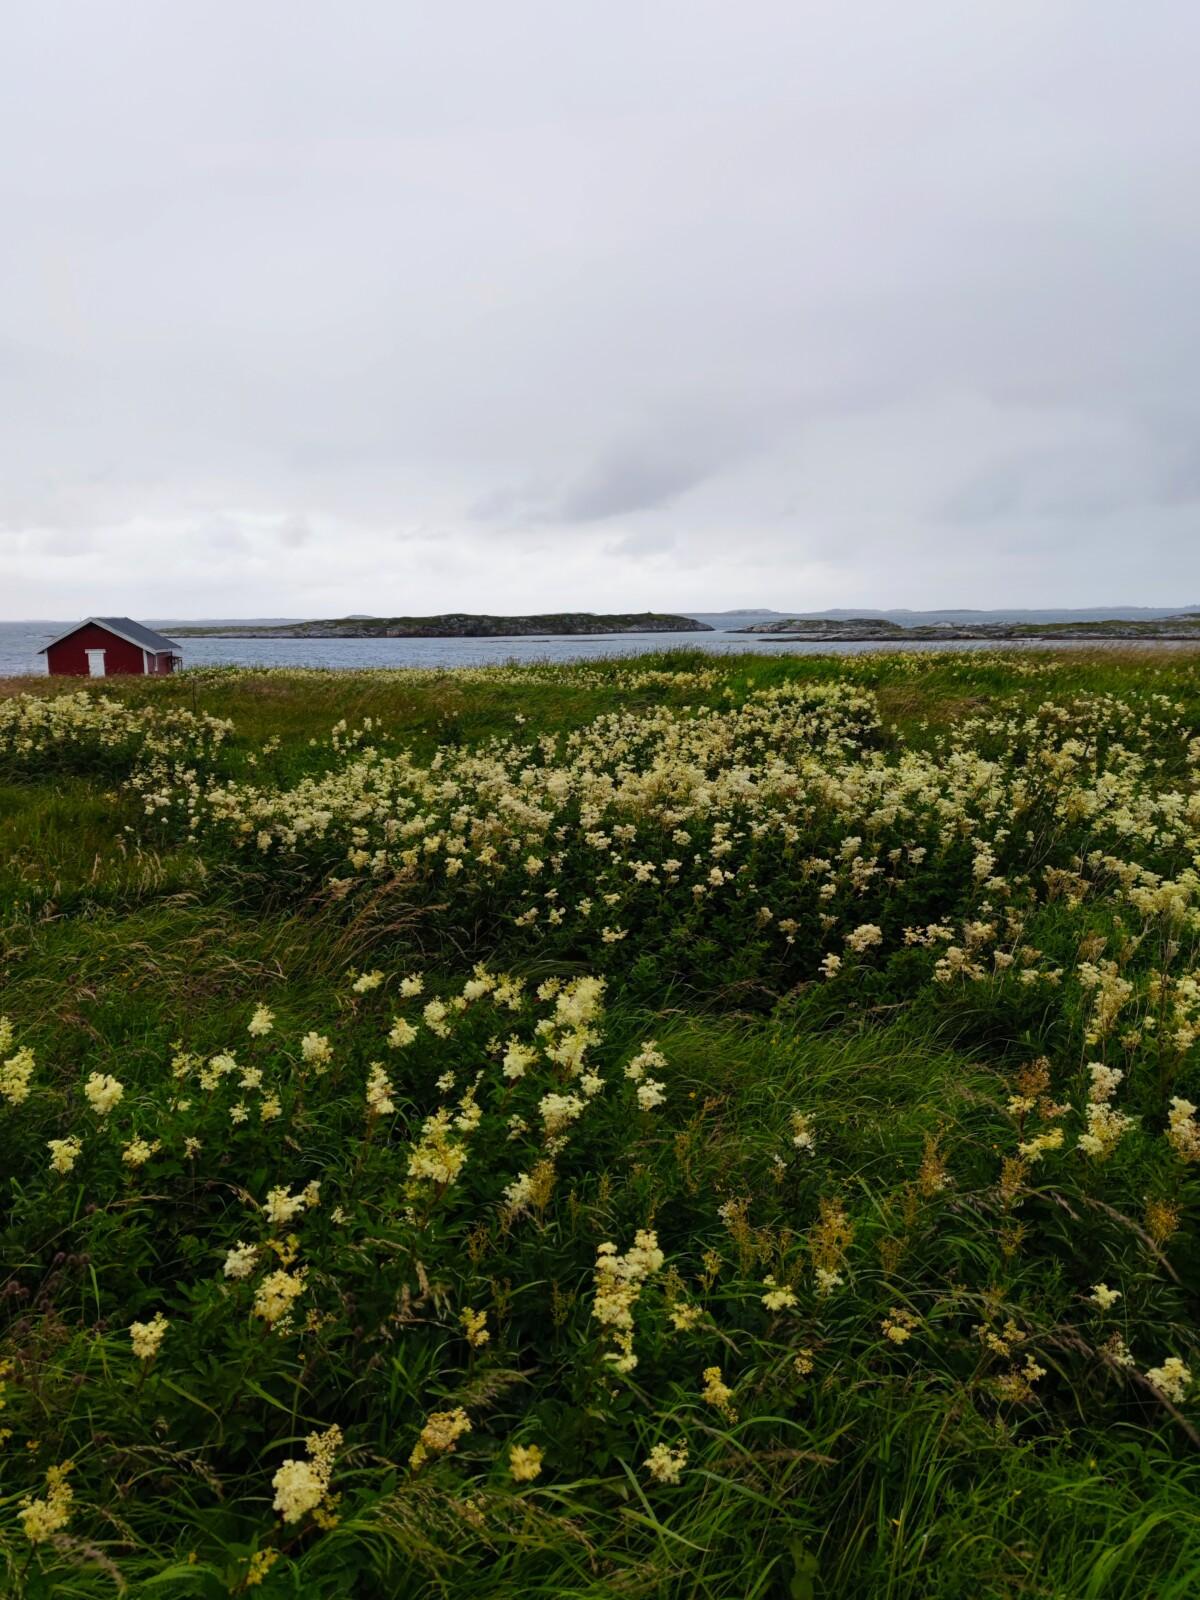 bildedryss-bilder-nordnorge-nord-norge-seløy-seløya-helgeland-herøy-sandnessjøen-mosjøen-natur-norge-norway-northofnorway-trondheim-vakkernatur-isalicious-klartvann-strang-norgesommer-norgessommer-sommer-helgelandskysten-isalicious.blogg.no-natur-fjell-strand-sjø-hav-